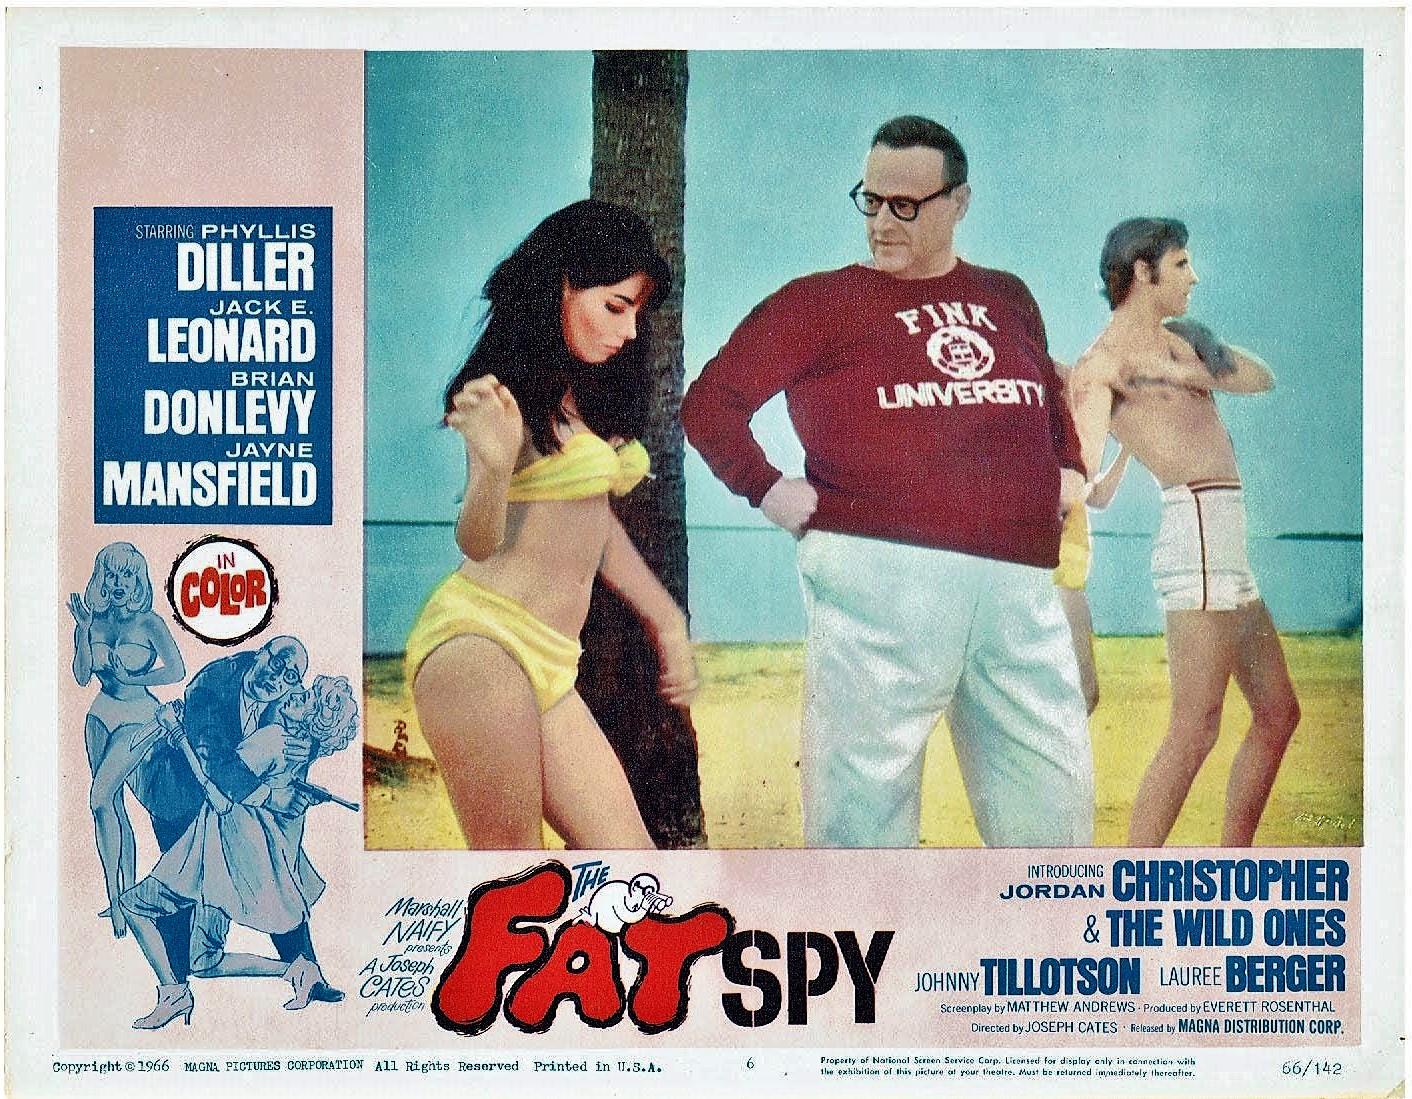 Jack E. Leonard in The Fat Spy (1966)